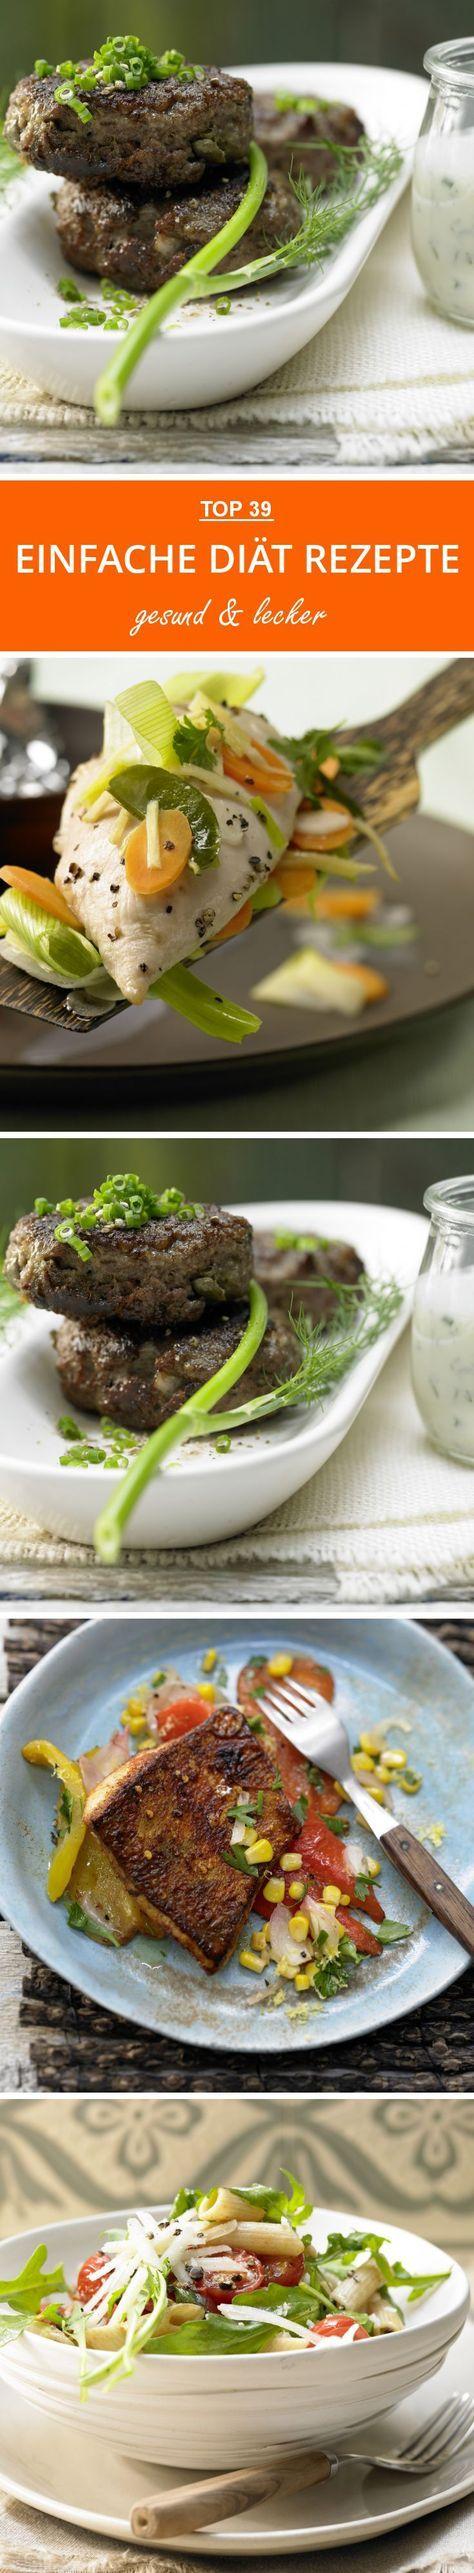 Einfache Diät Rezepte   eatsmarter.de